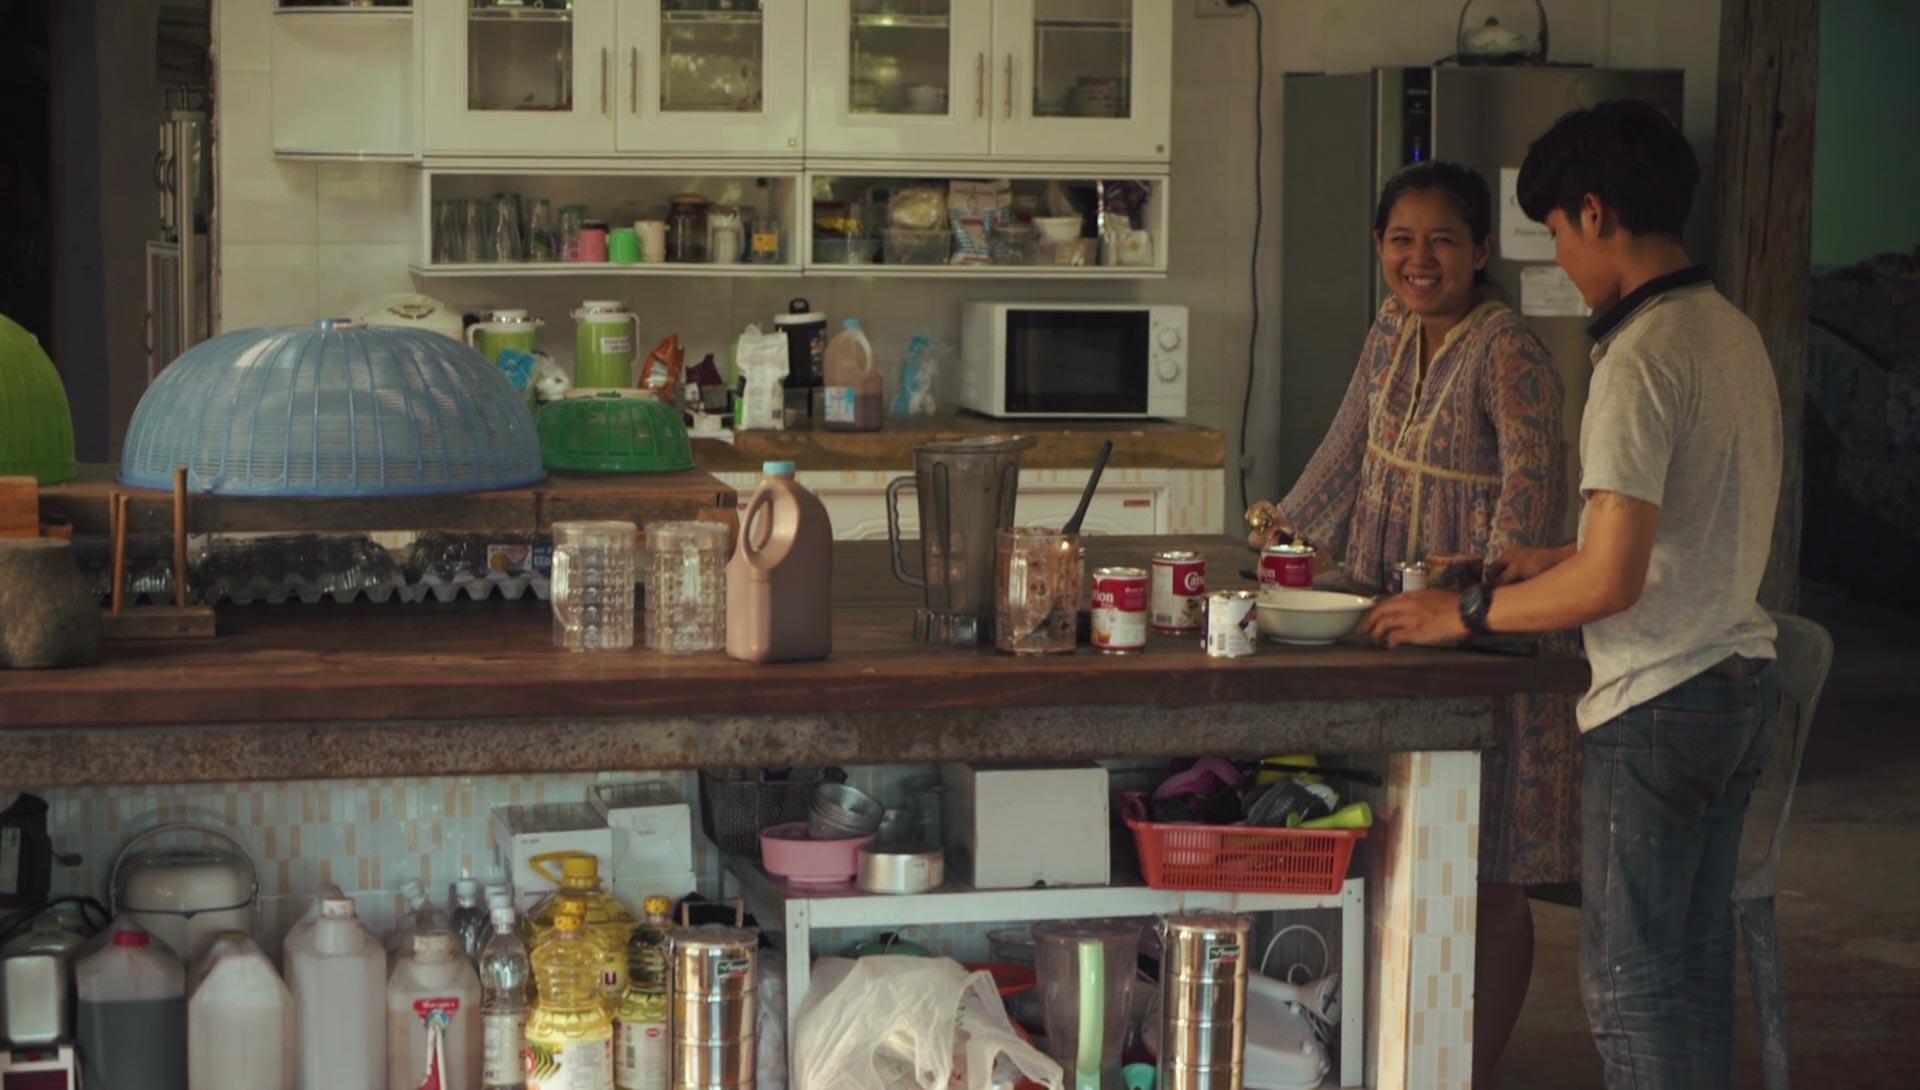 Preparing food in the kitchens at Daruma ecovillage